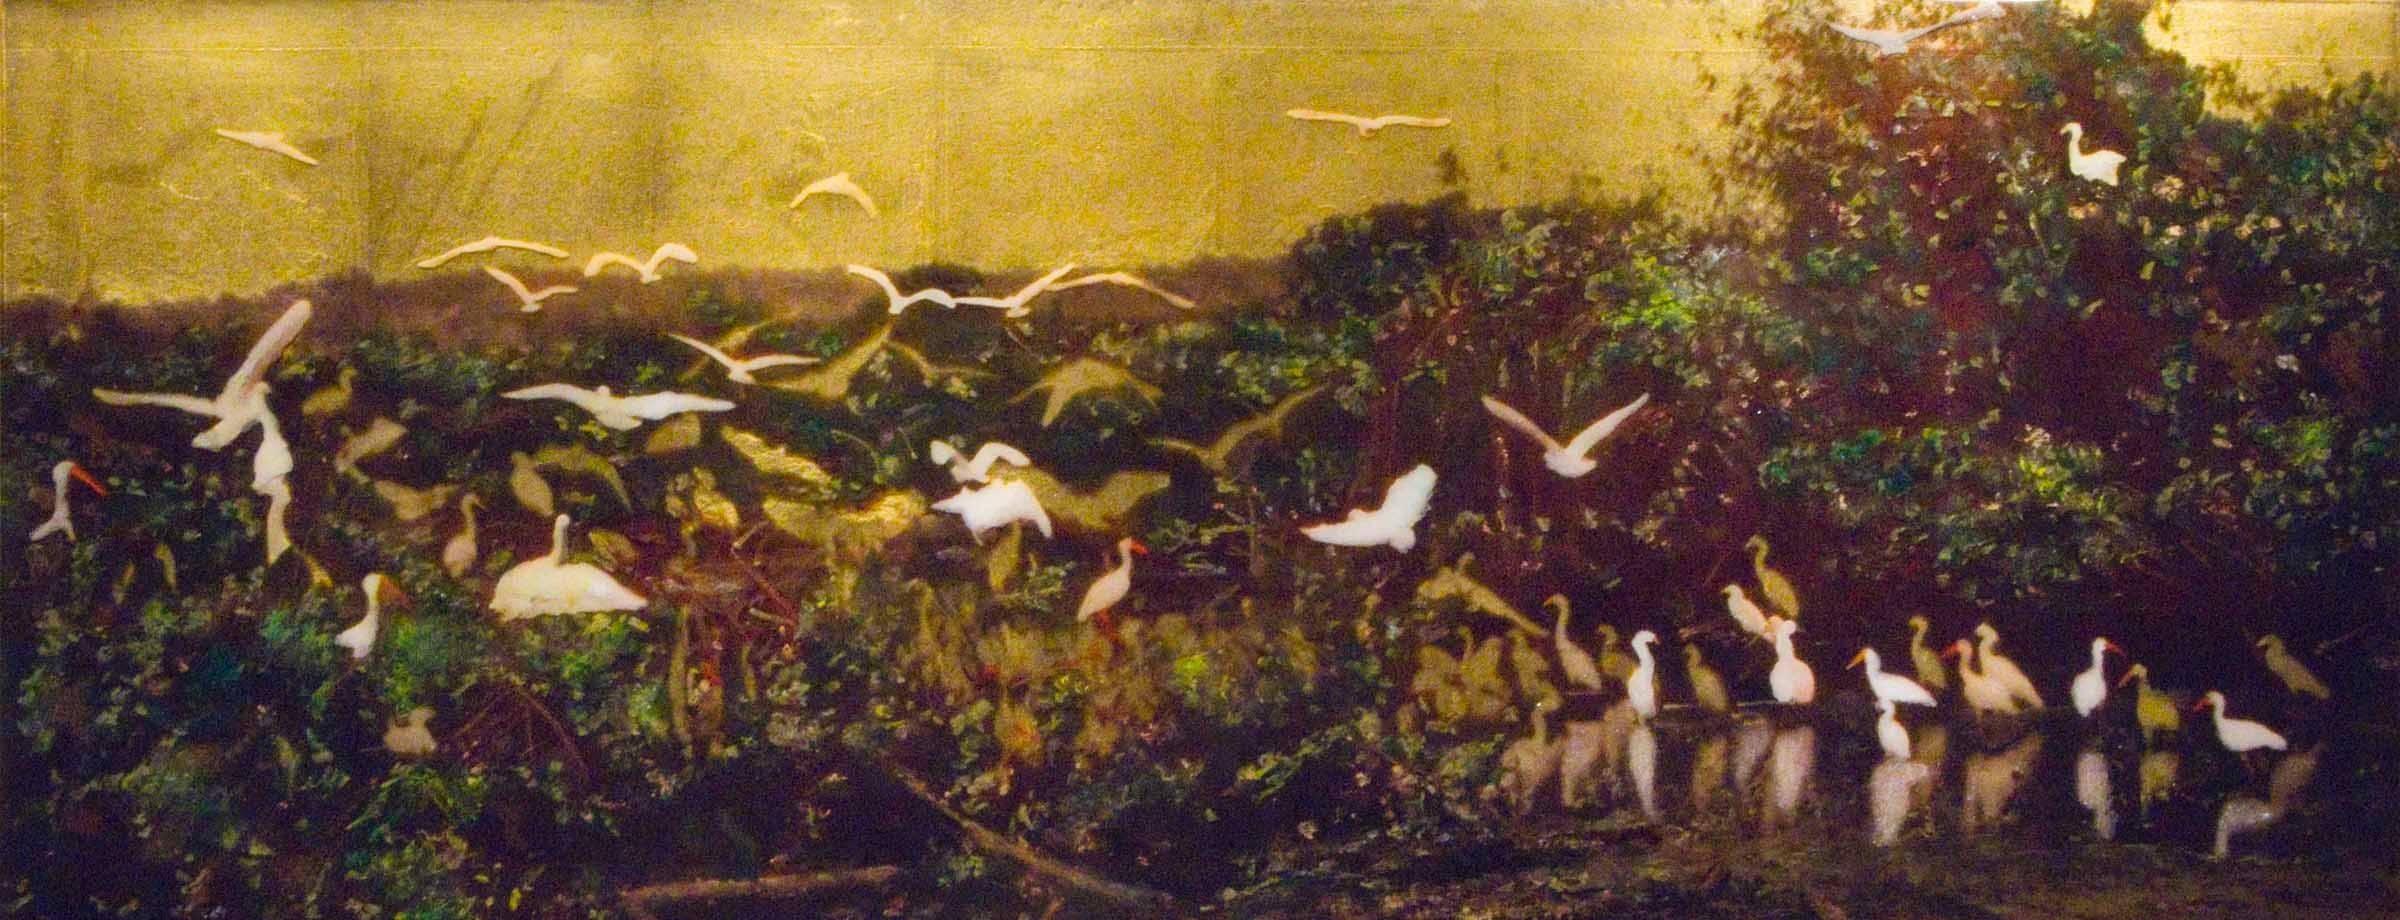 SITTING PRETTY, figurative landscape, yellow sky, white birds, nature, trees